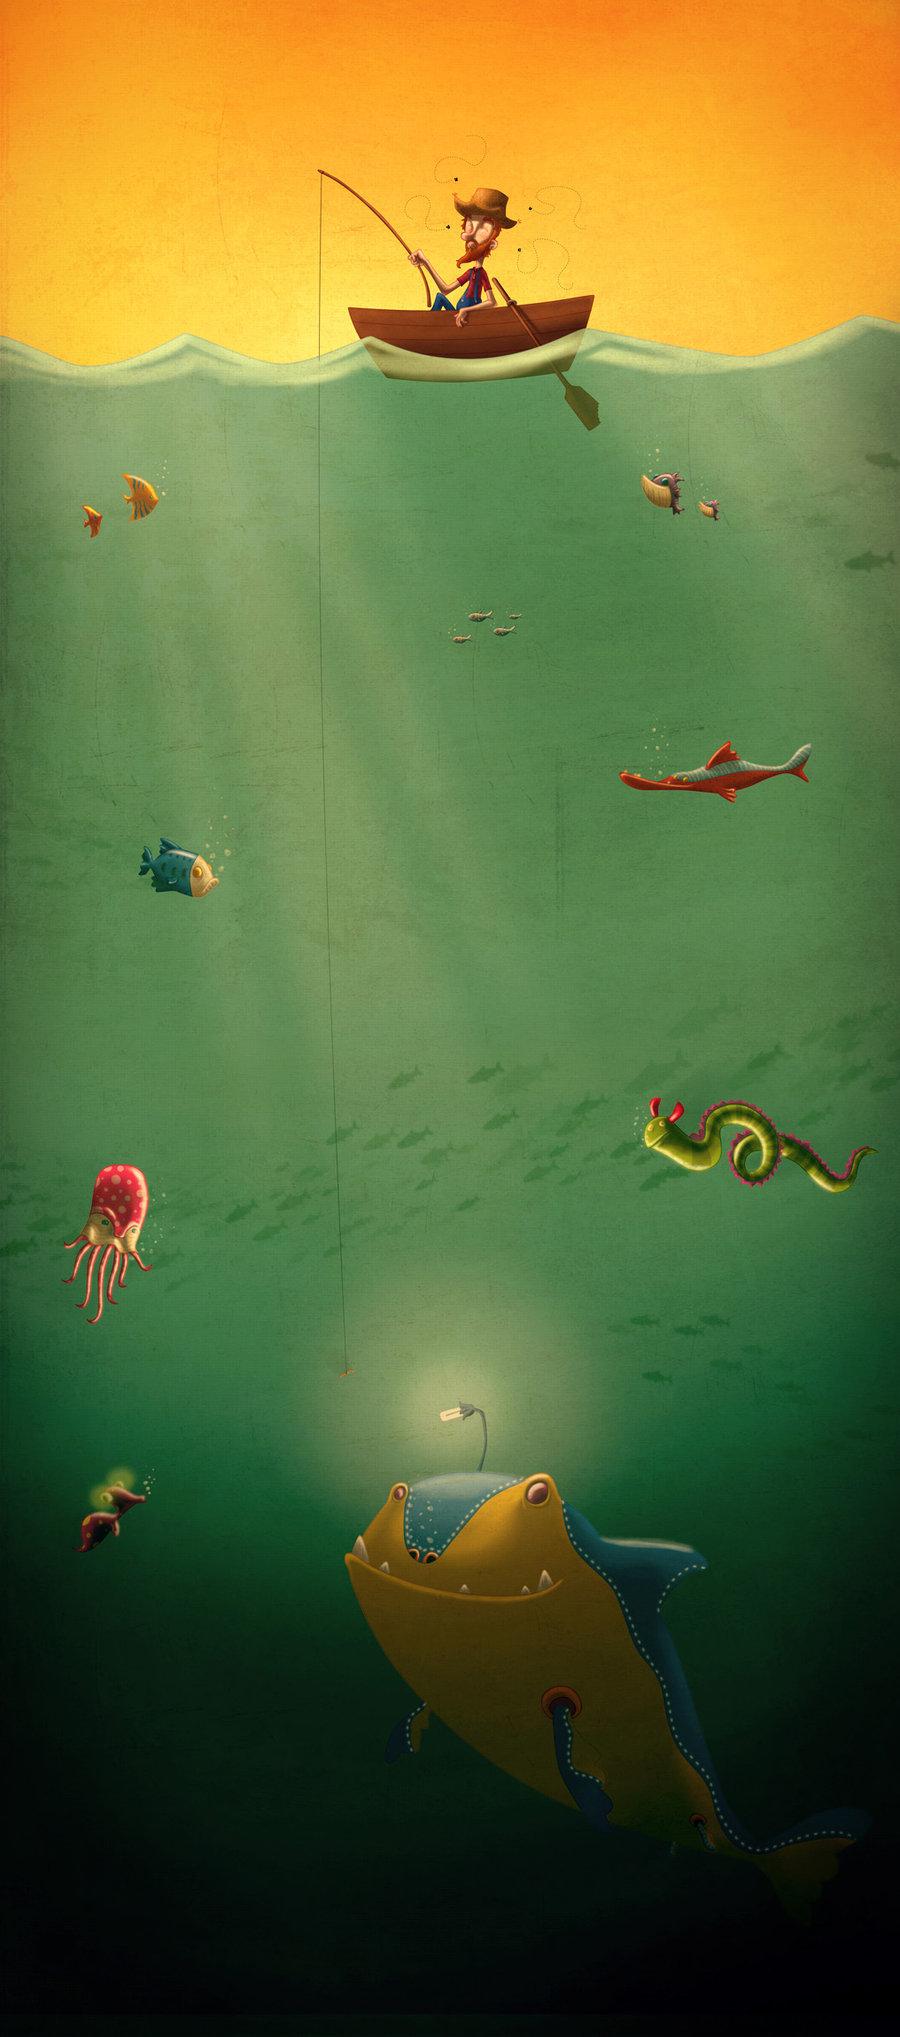 Amusing illustrations from Henrique Jorge